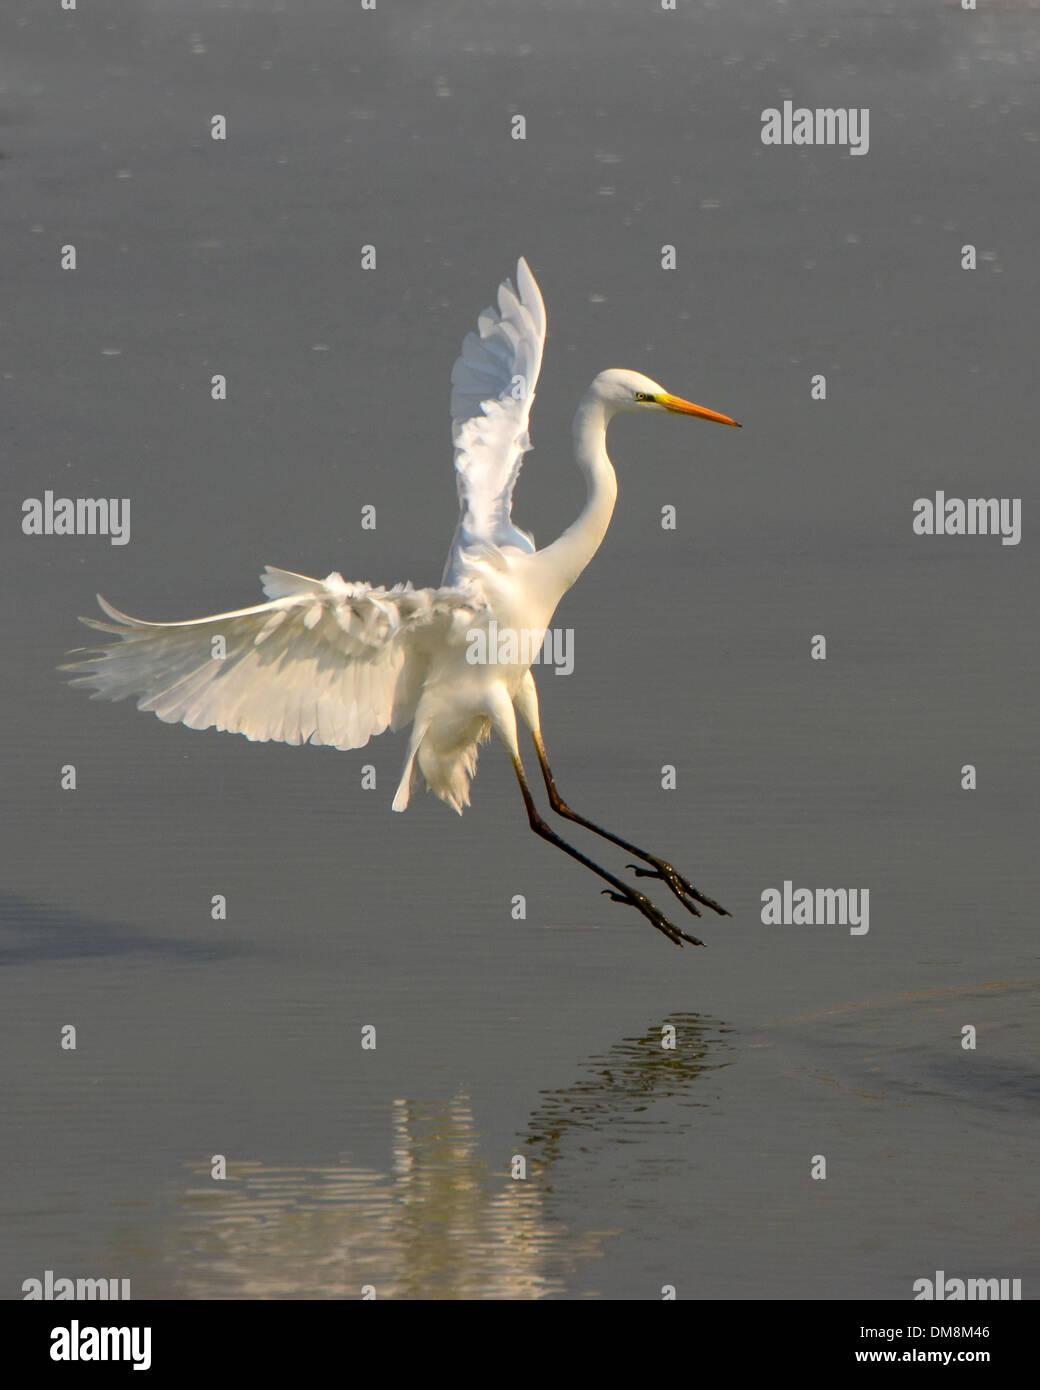 Great egret ( Ardea alba) landing in water - Stock Image